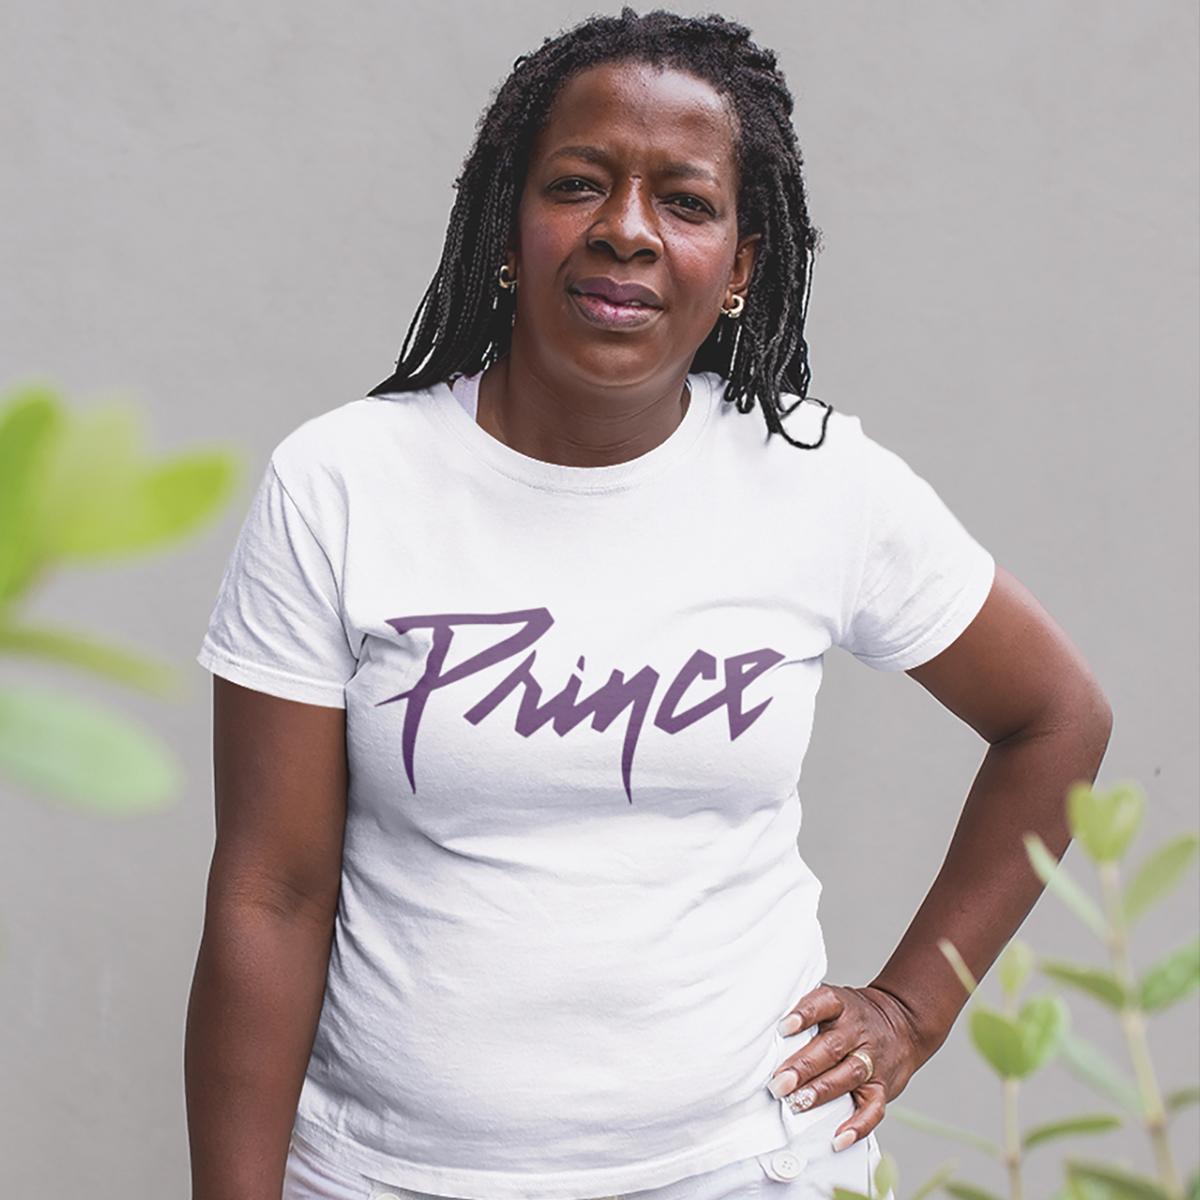 Prince Logo T-shirt